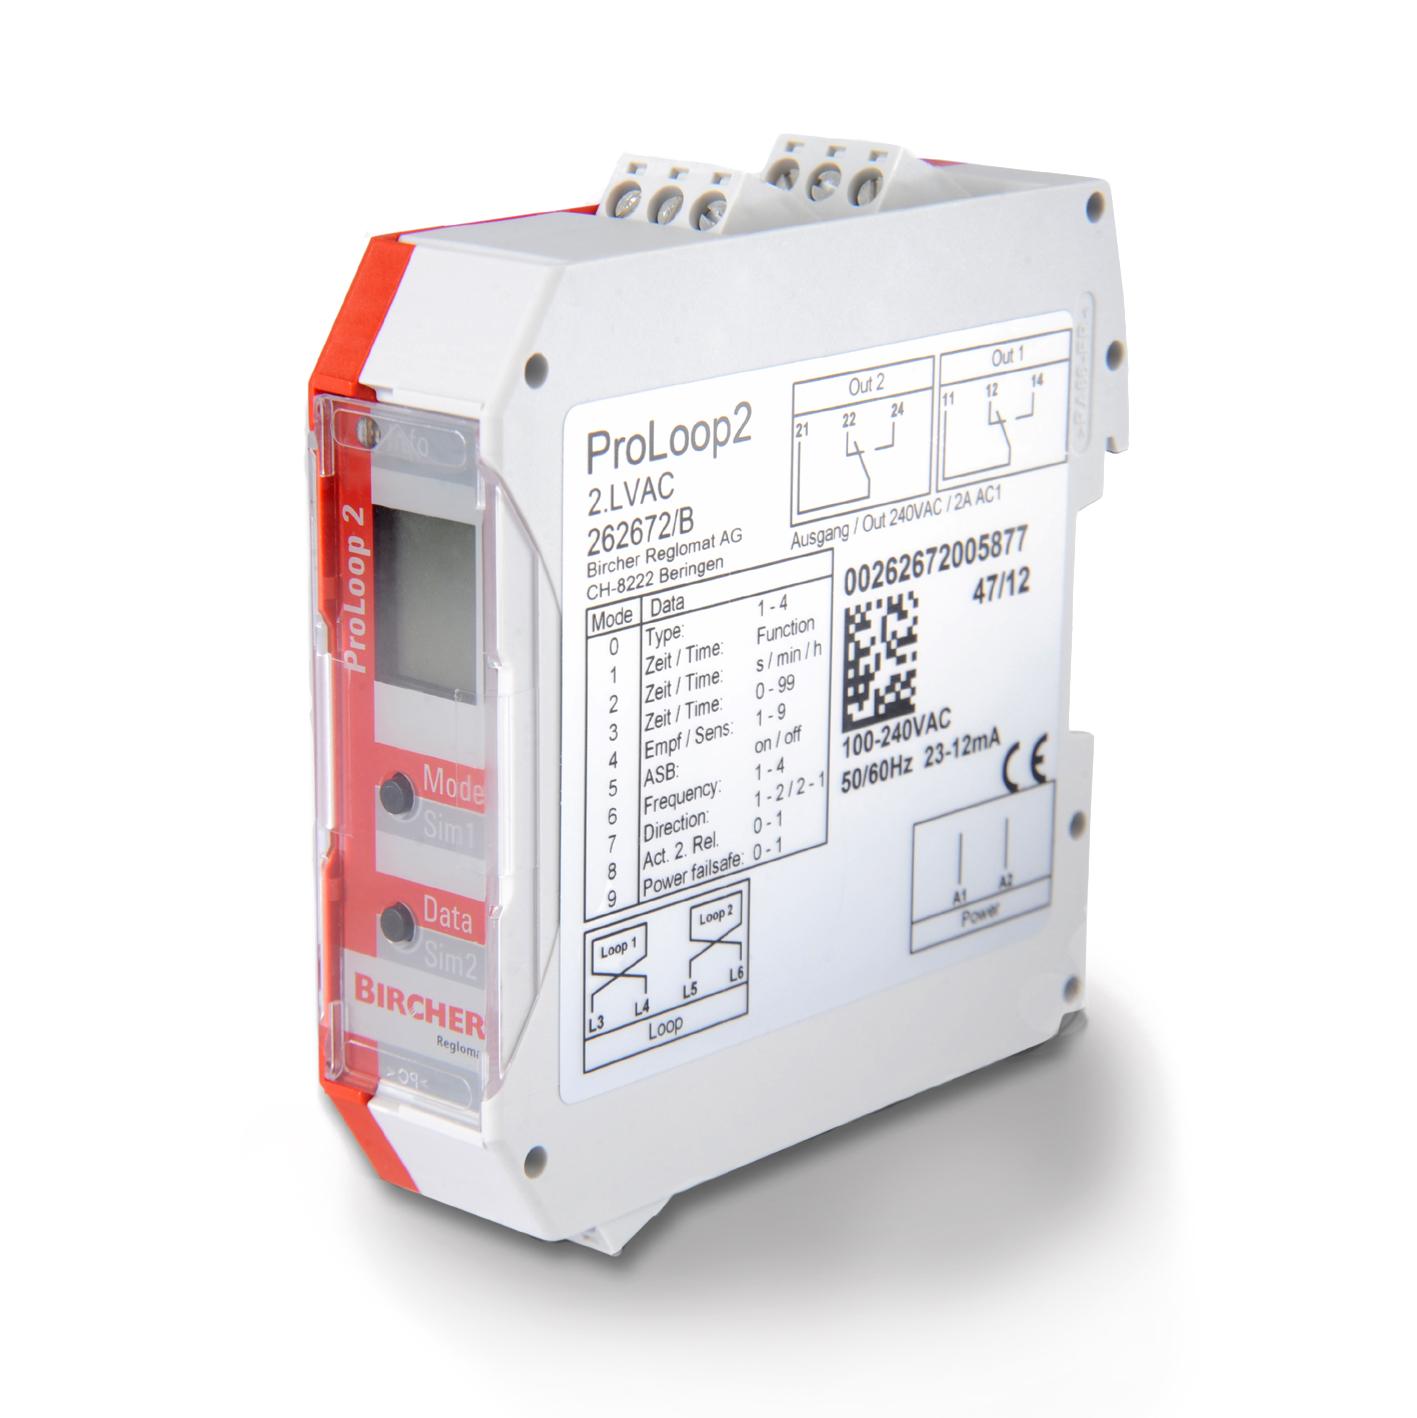 Marantec Control 403 Schleifendetektor